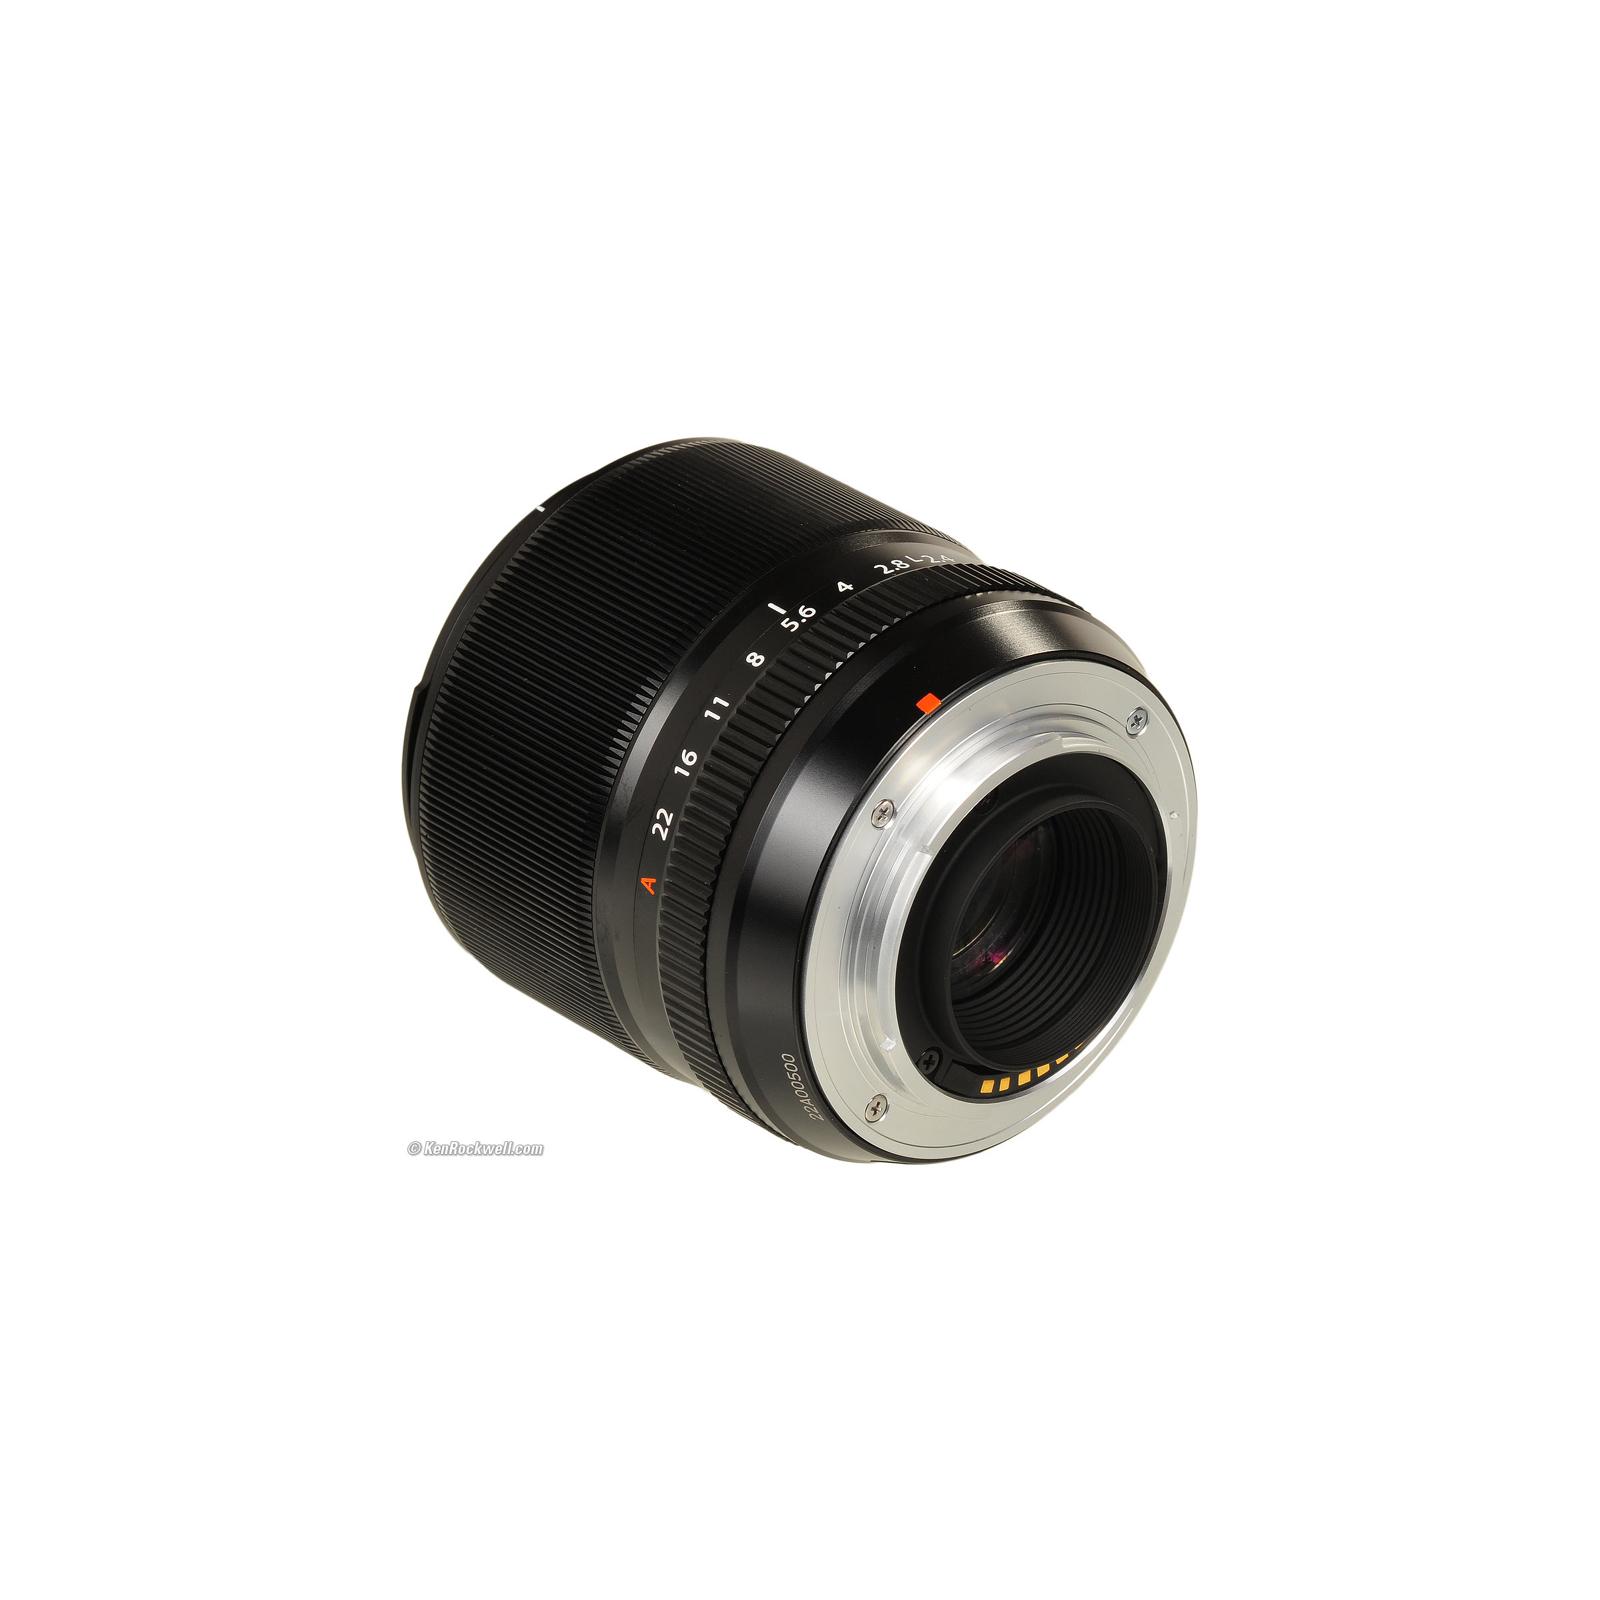 Объектив Fujifilm XF-60mm F2.4 R Macro (16240767) изображение 4